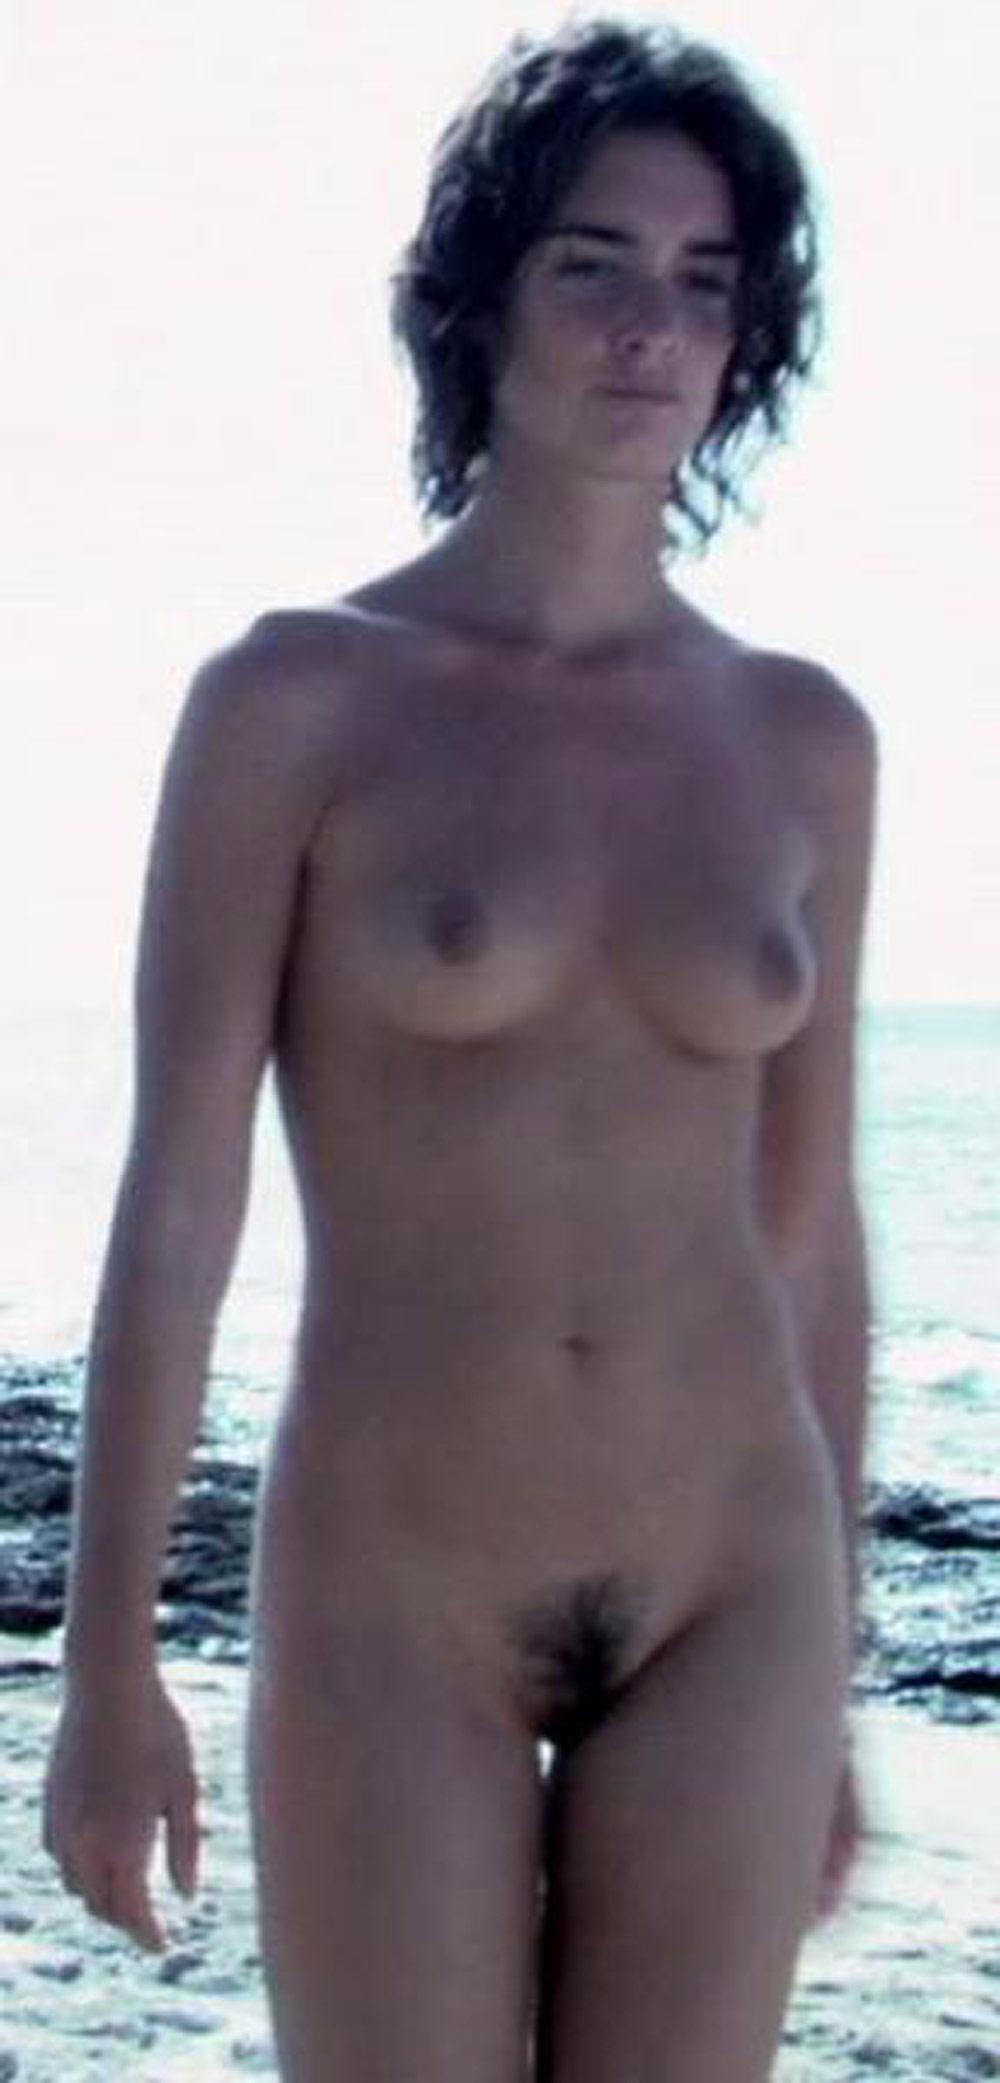 Flick shagwell anal gape contest